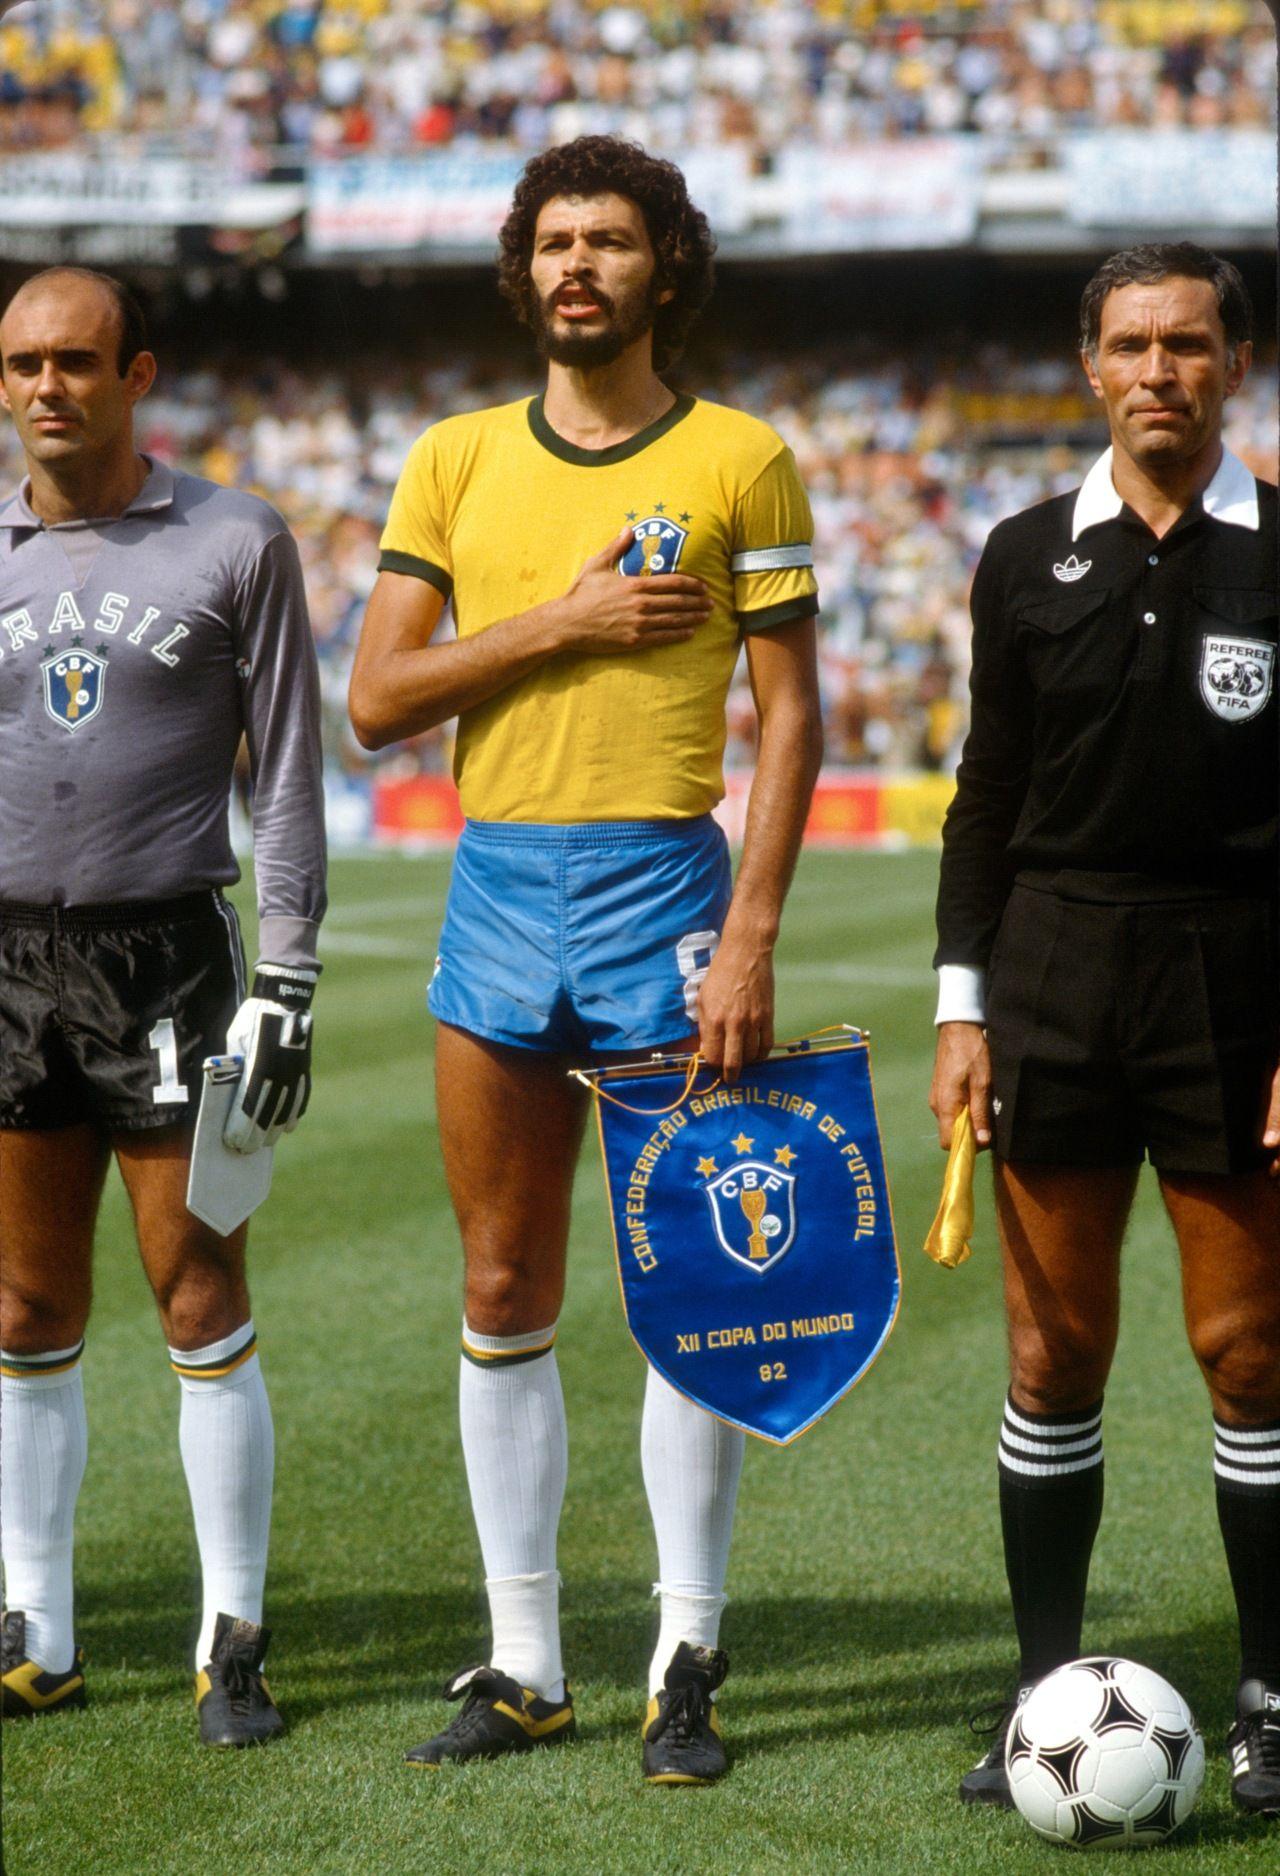 kinda glad the 80's shorts have never returned. Socrates